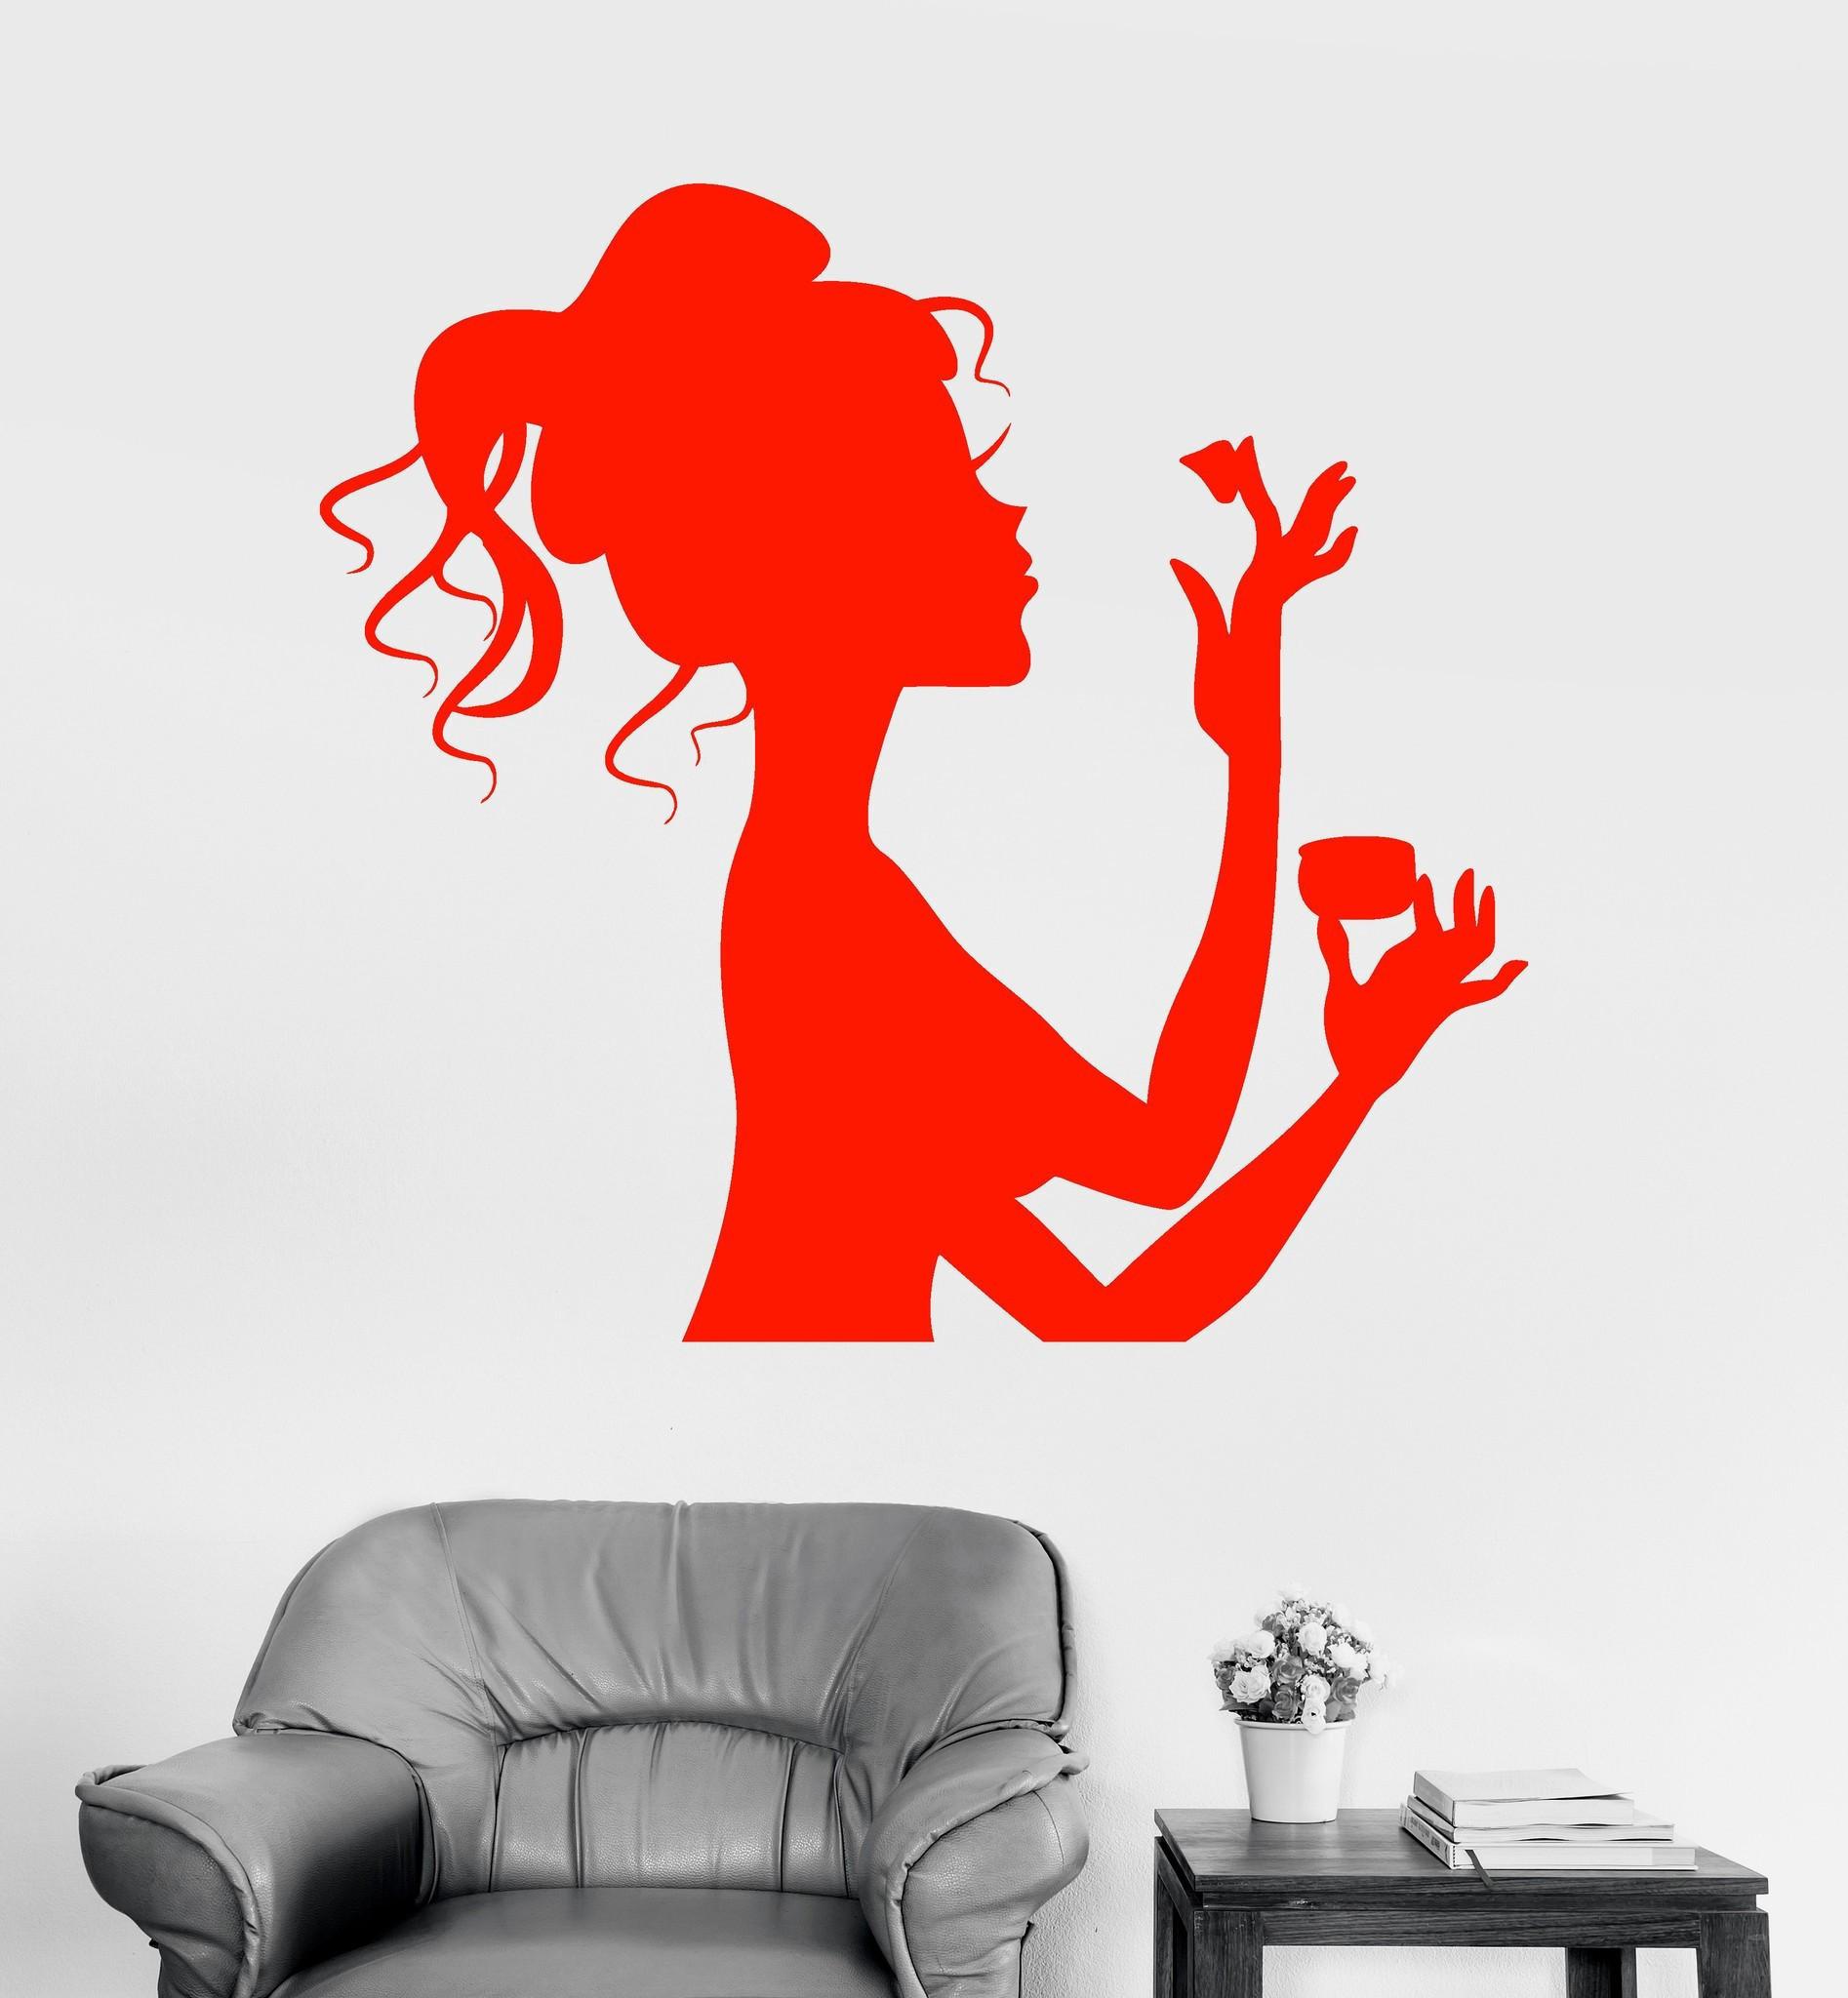 26 Elegant Michaels Glass Vases 2021 free download michaels glass vases of wall decor michaels 2018 lovely make your own stickers michaels in wall decor michaels 2018 lovely make your own stickers michaels